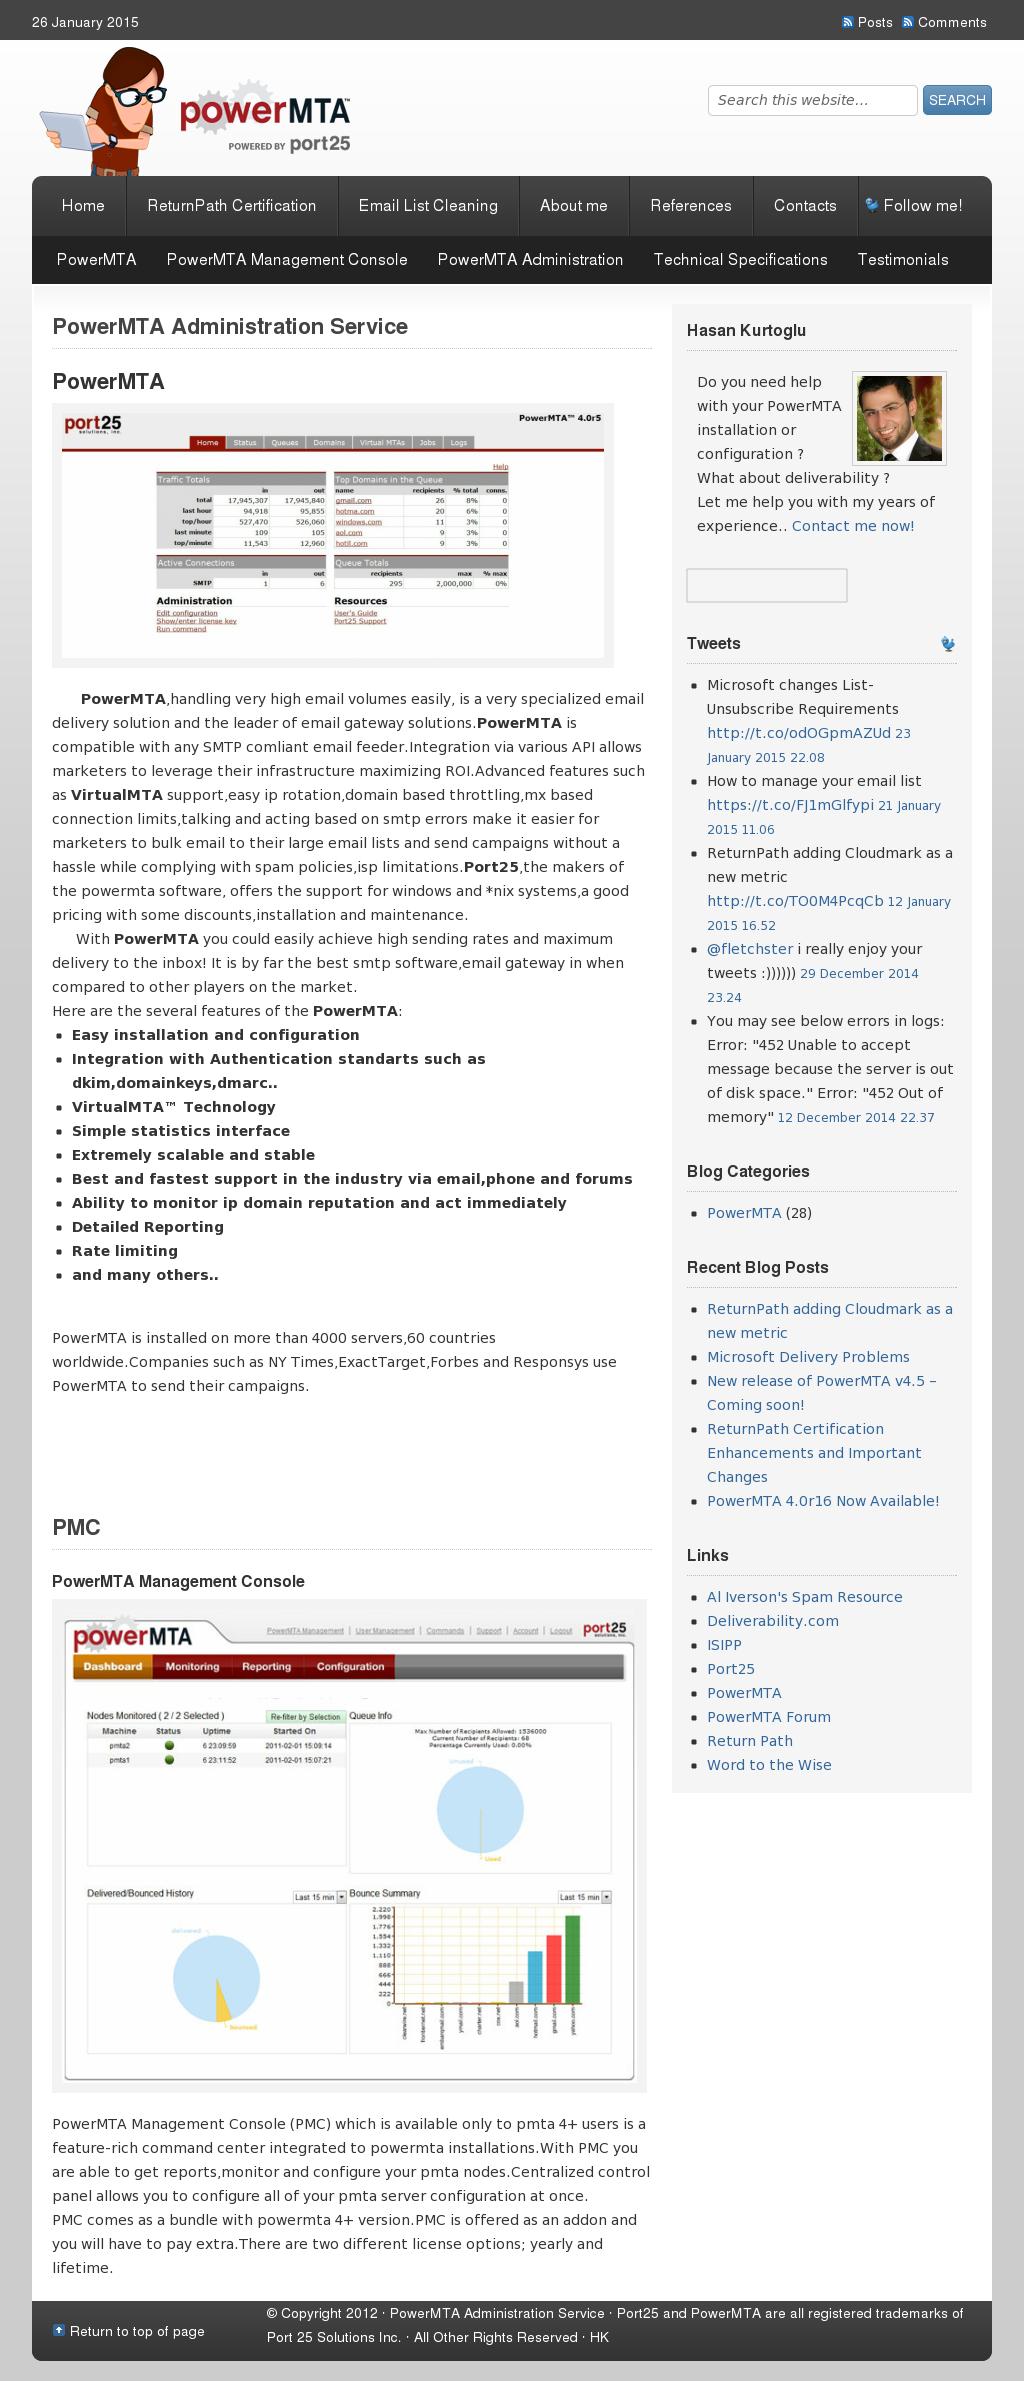 Powermta Administration Service Competitors, Revenue and